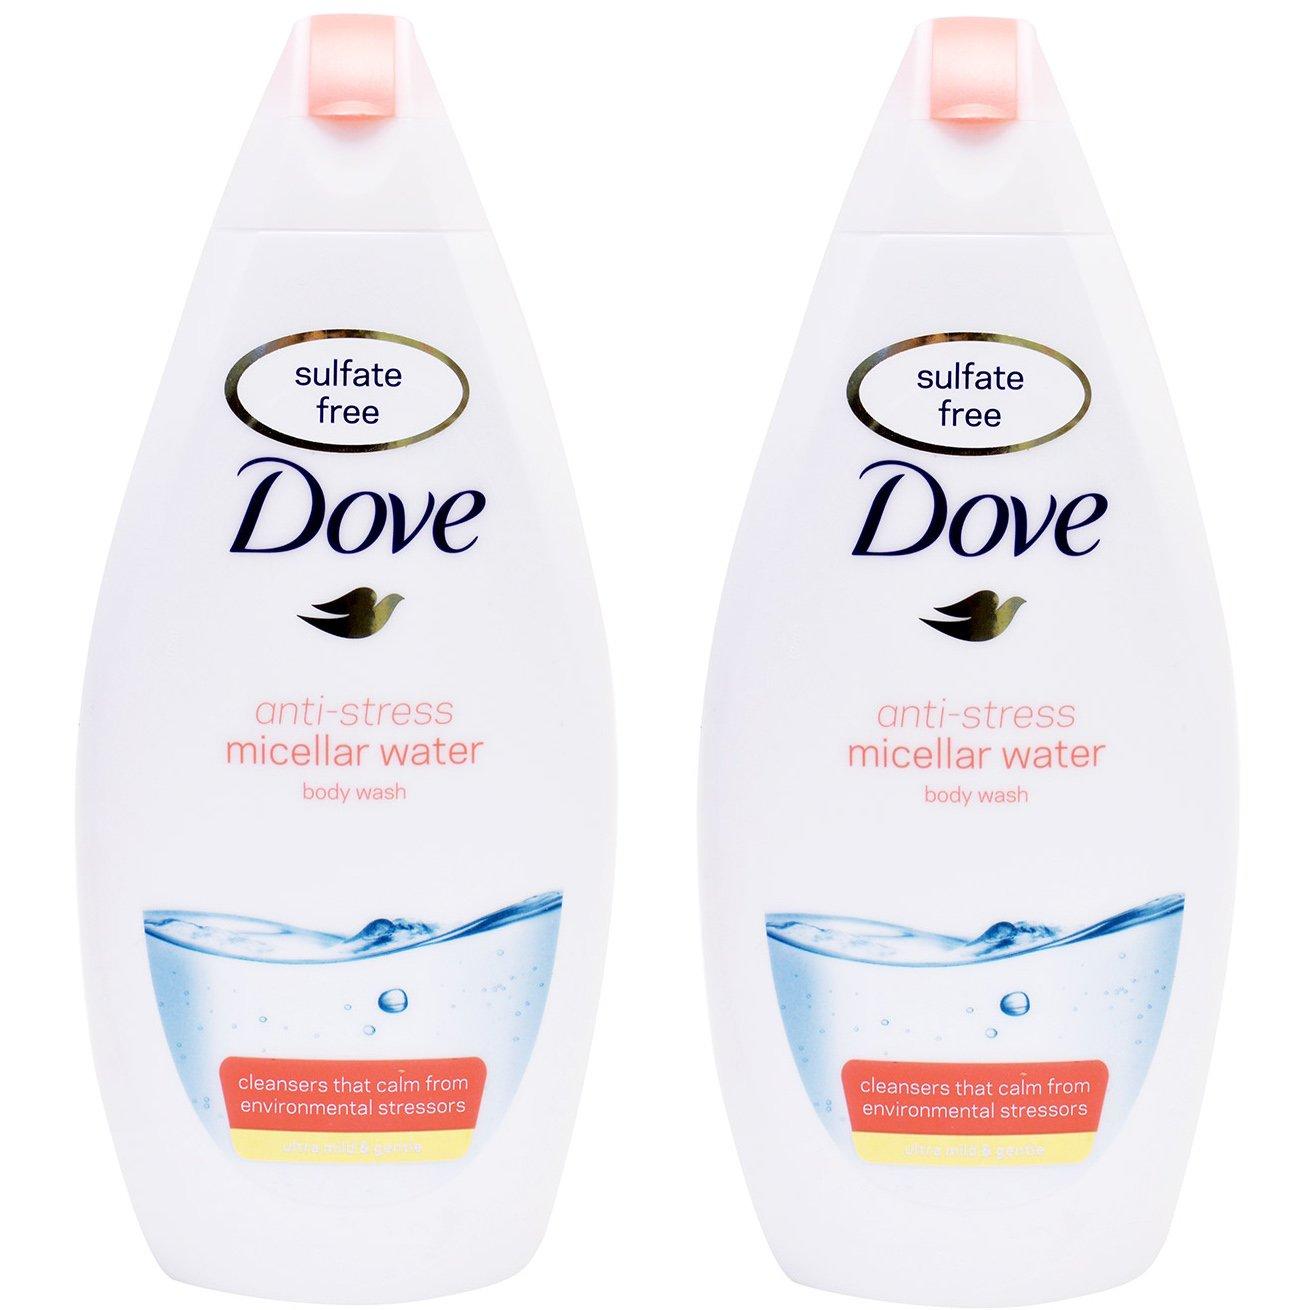 Dove Πακέτο Προσφοράς Anti-Stress Micellar Water Body Wash Ήπιο, Απαλό Αφρόλουτρο με Anti-Strees Δράση 2x750ml 1+1 Δώρο